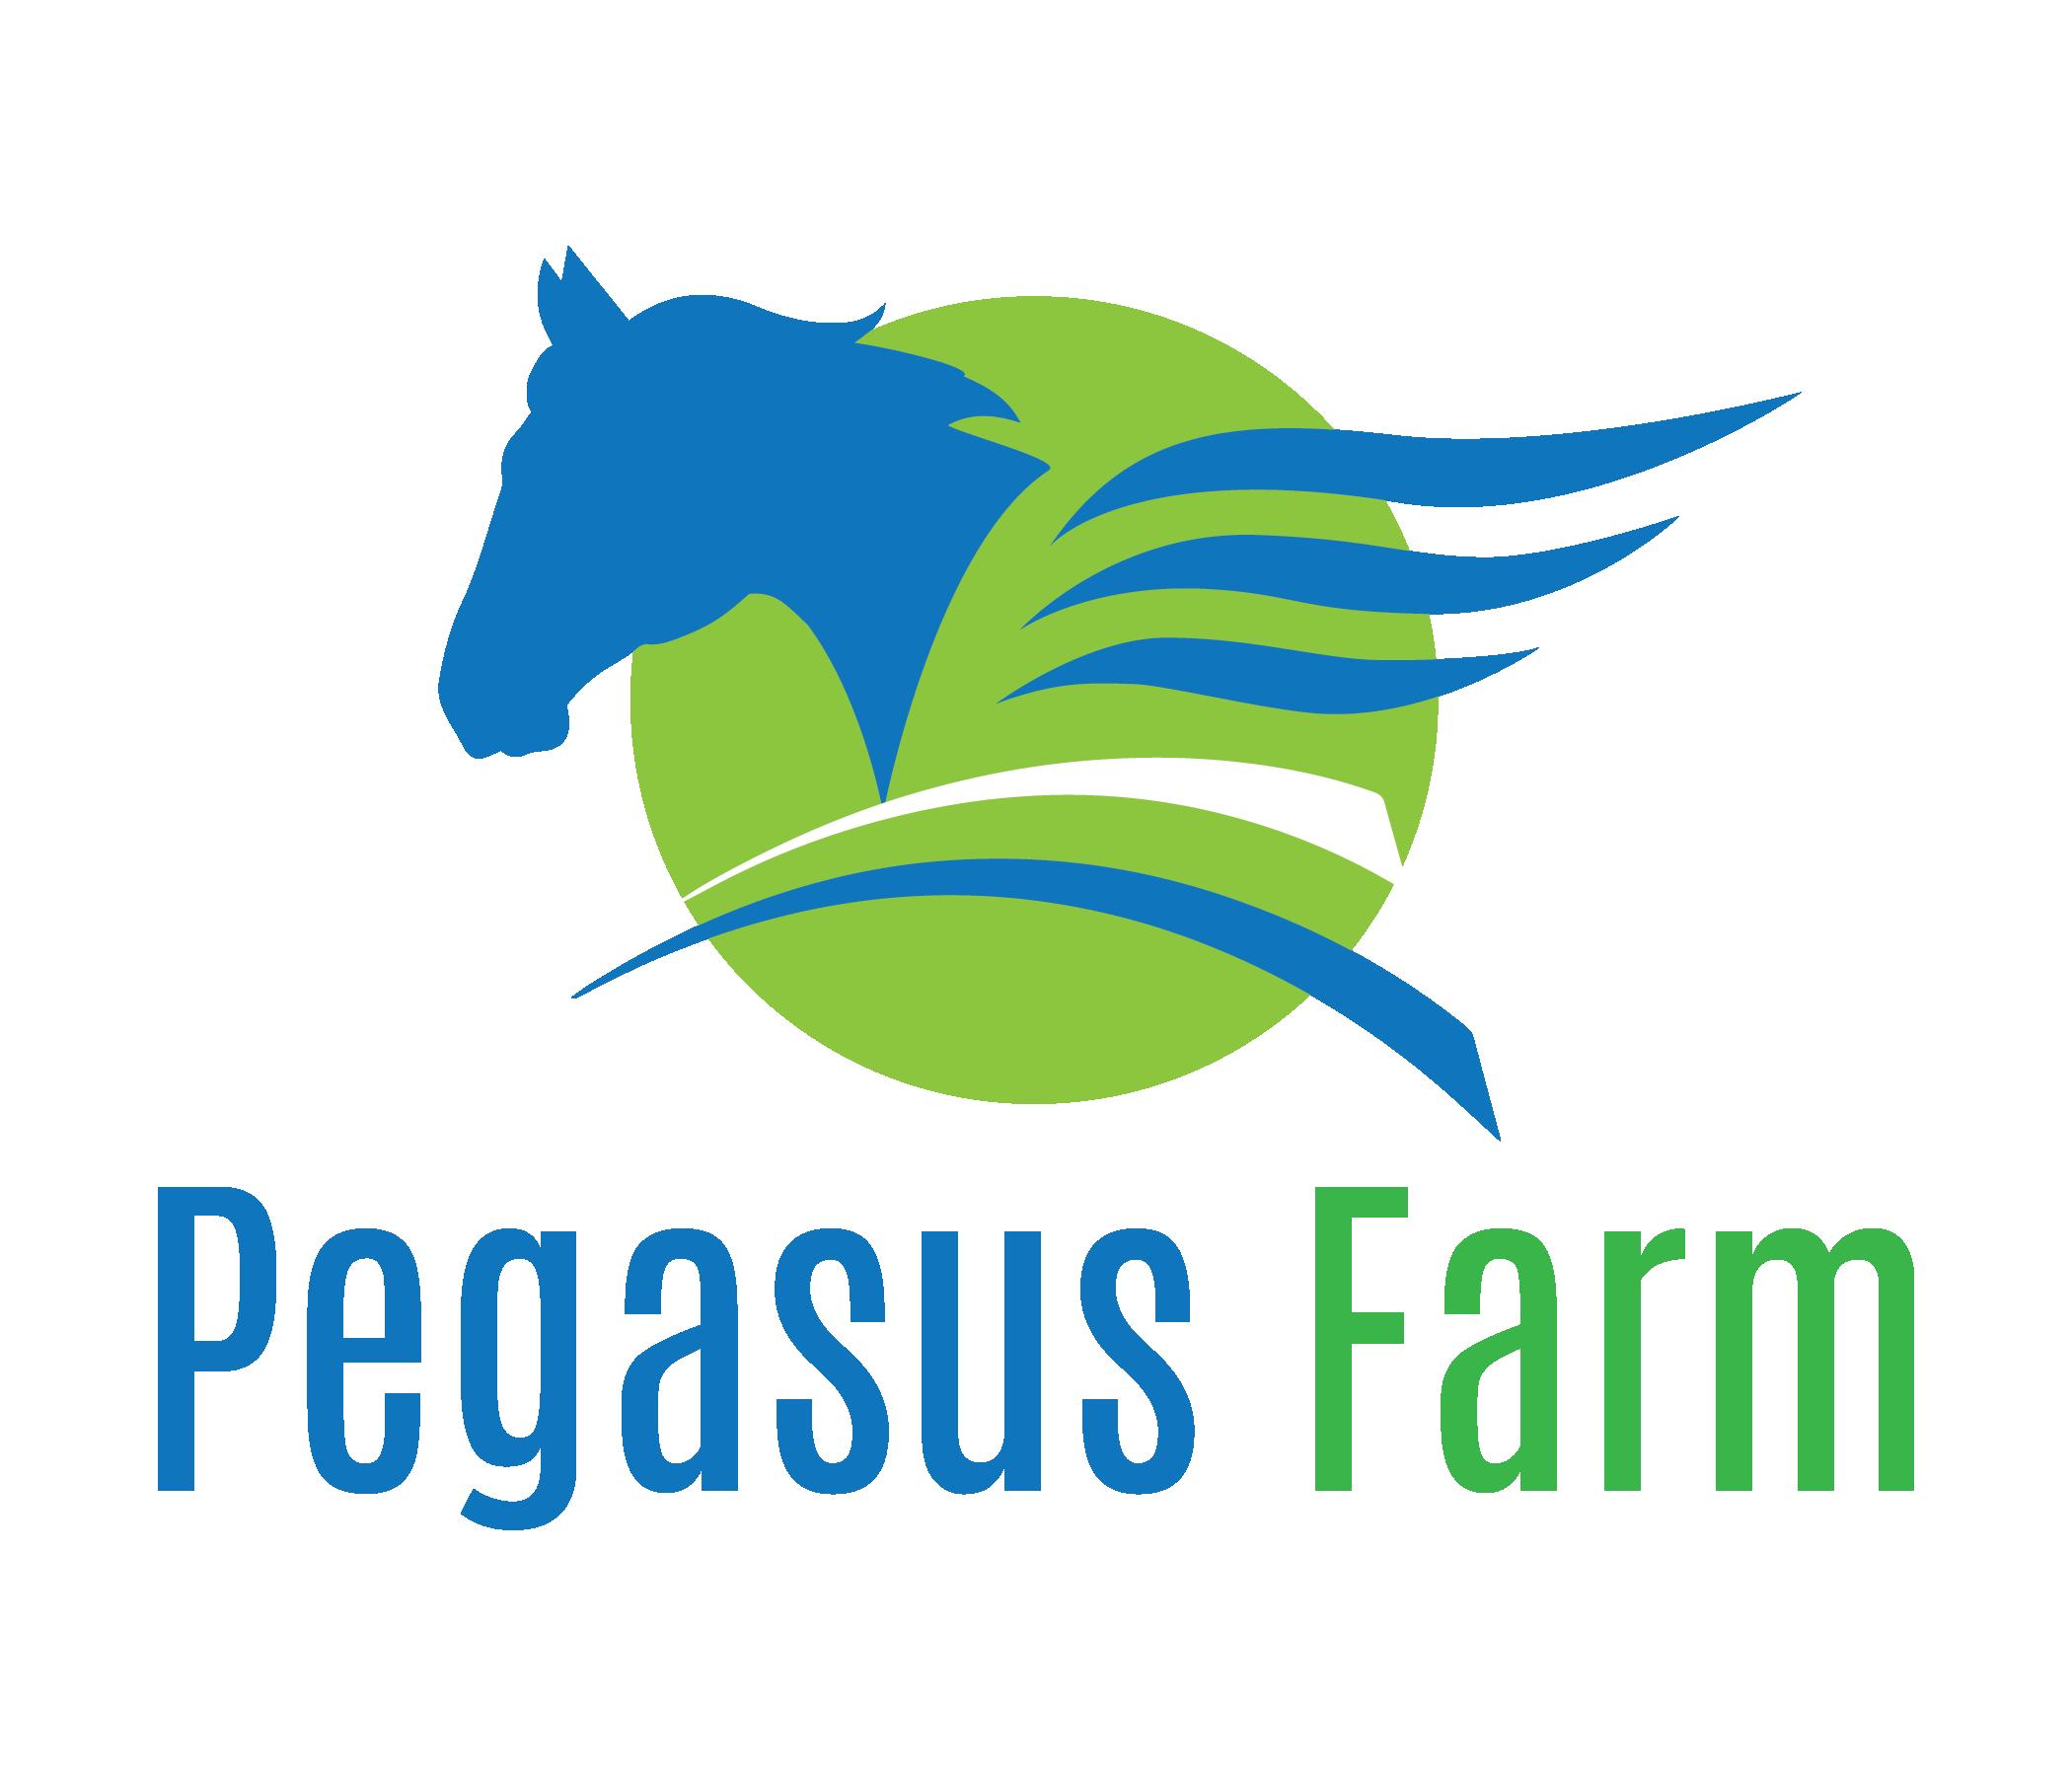 PEG FARMS Horse Logo RGB HiRes - Pegasus Farm Country Store And Gardens